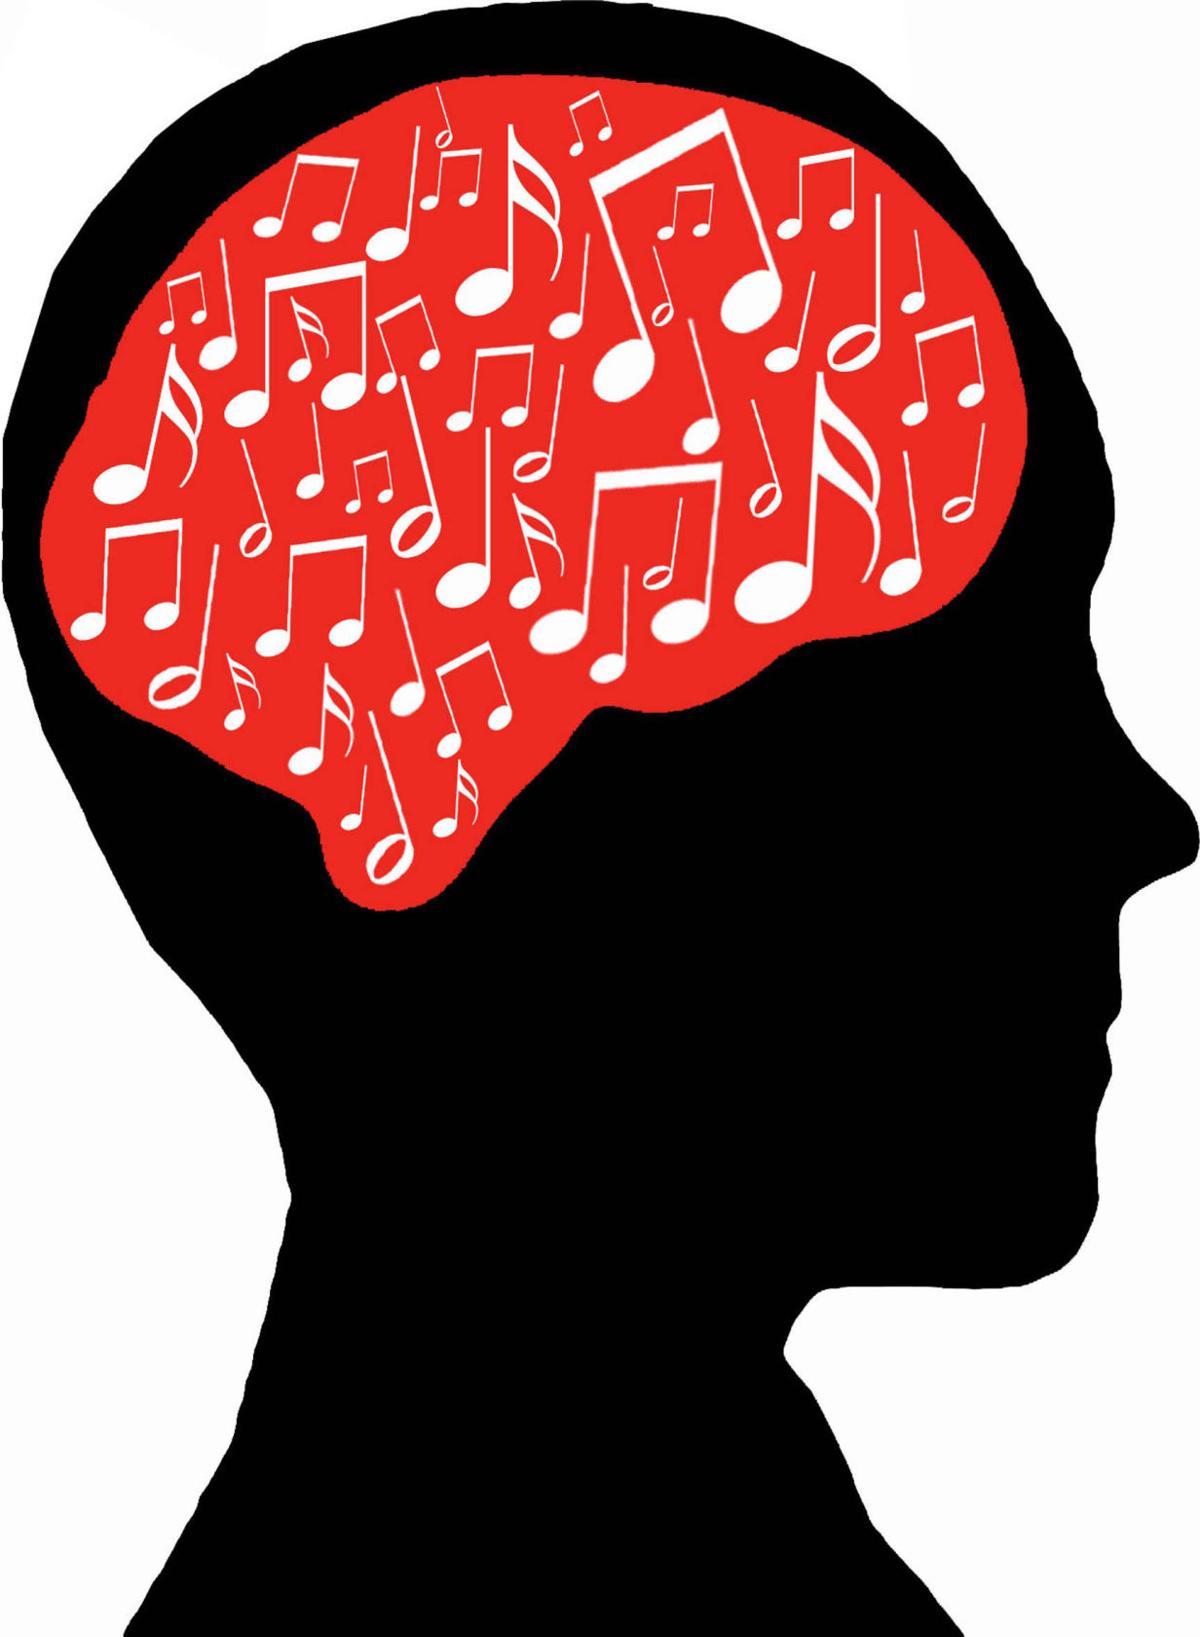 The musician's brain